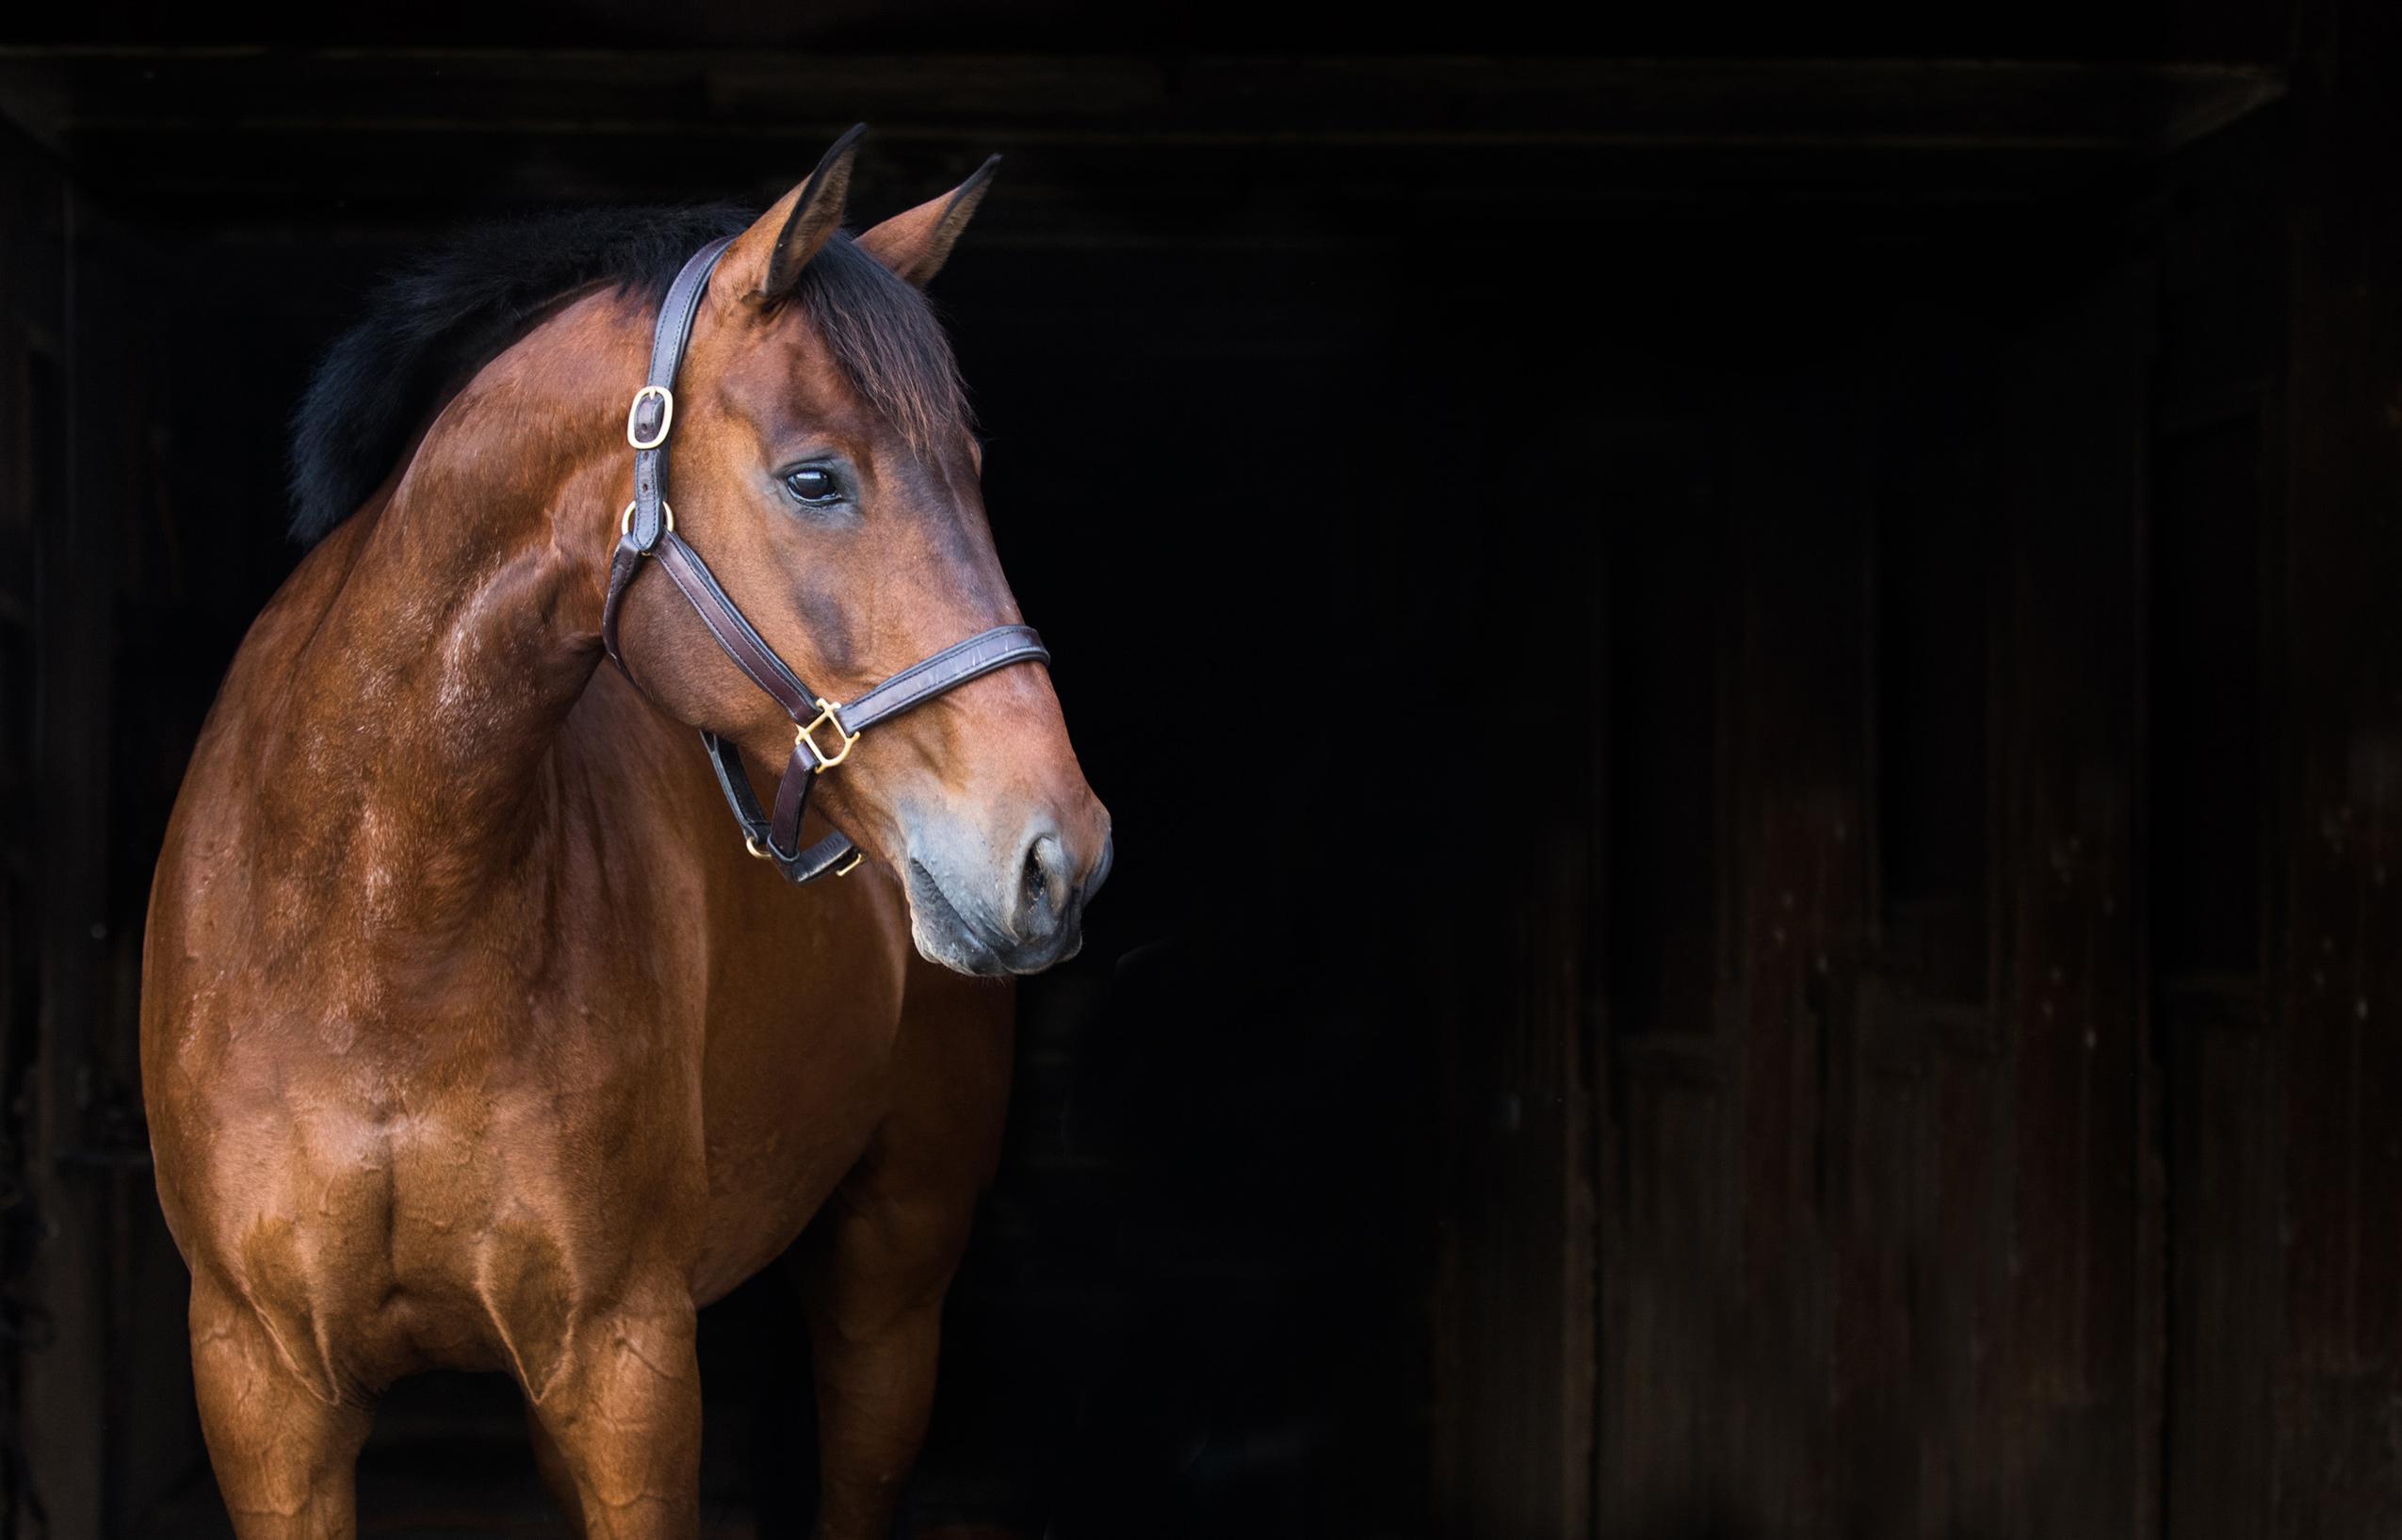 Fred-horse-equine-portrait.jpg